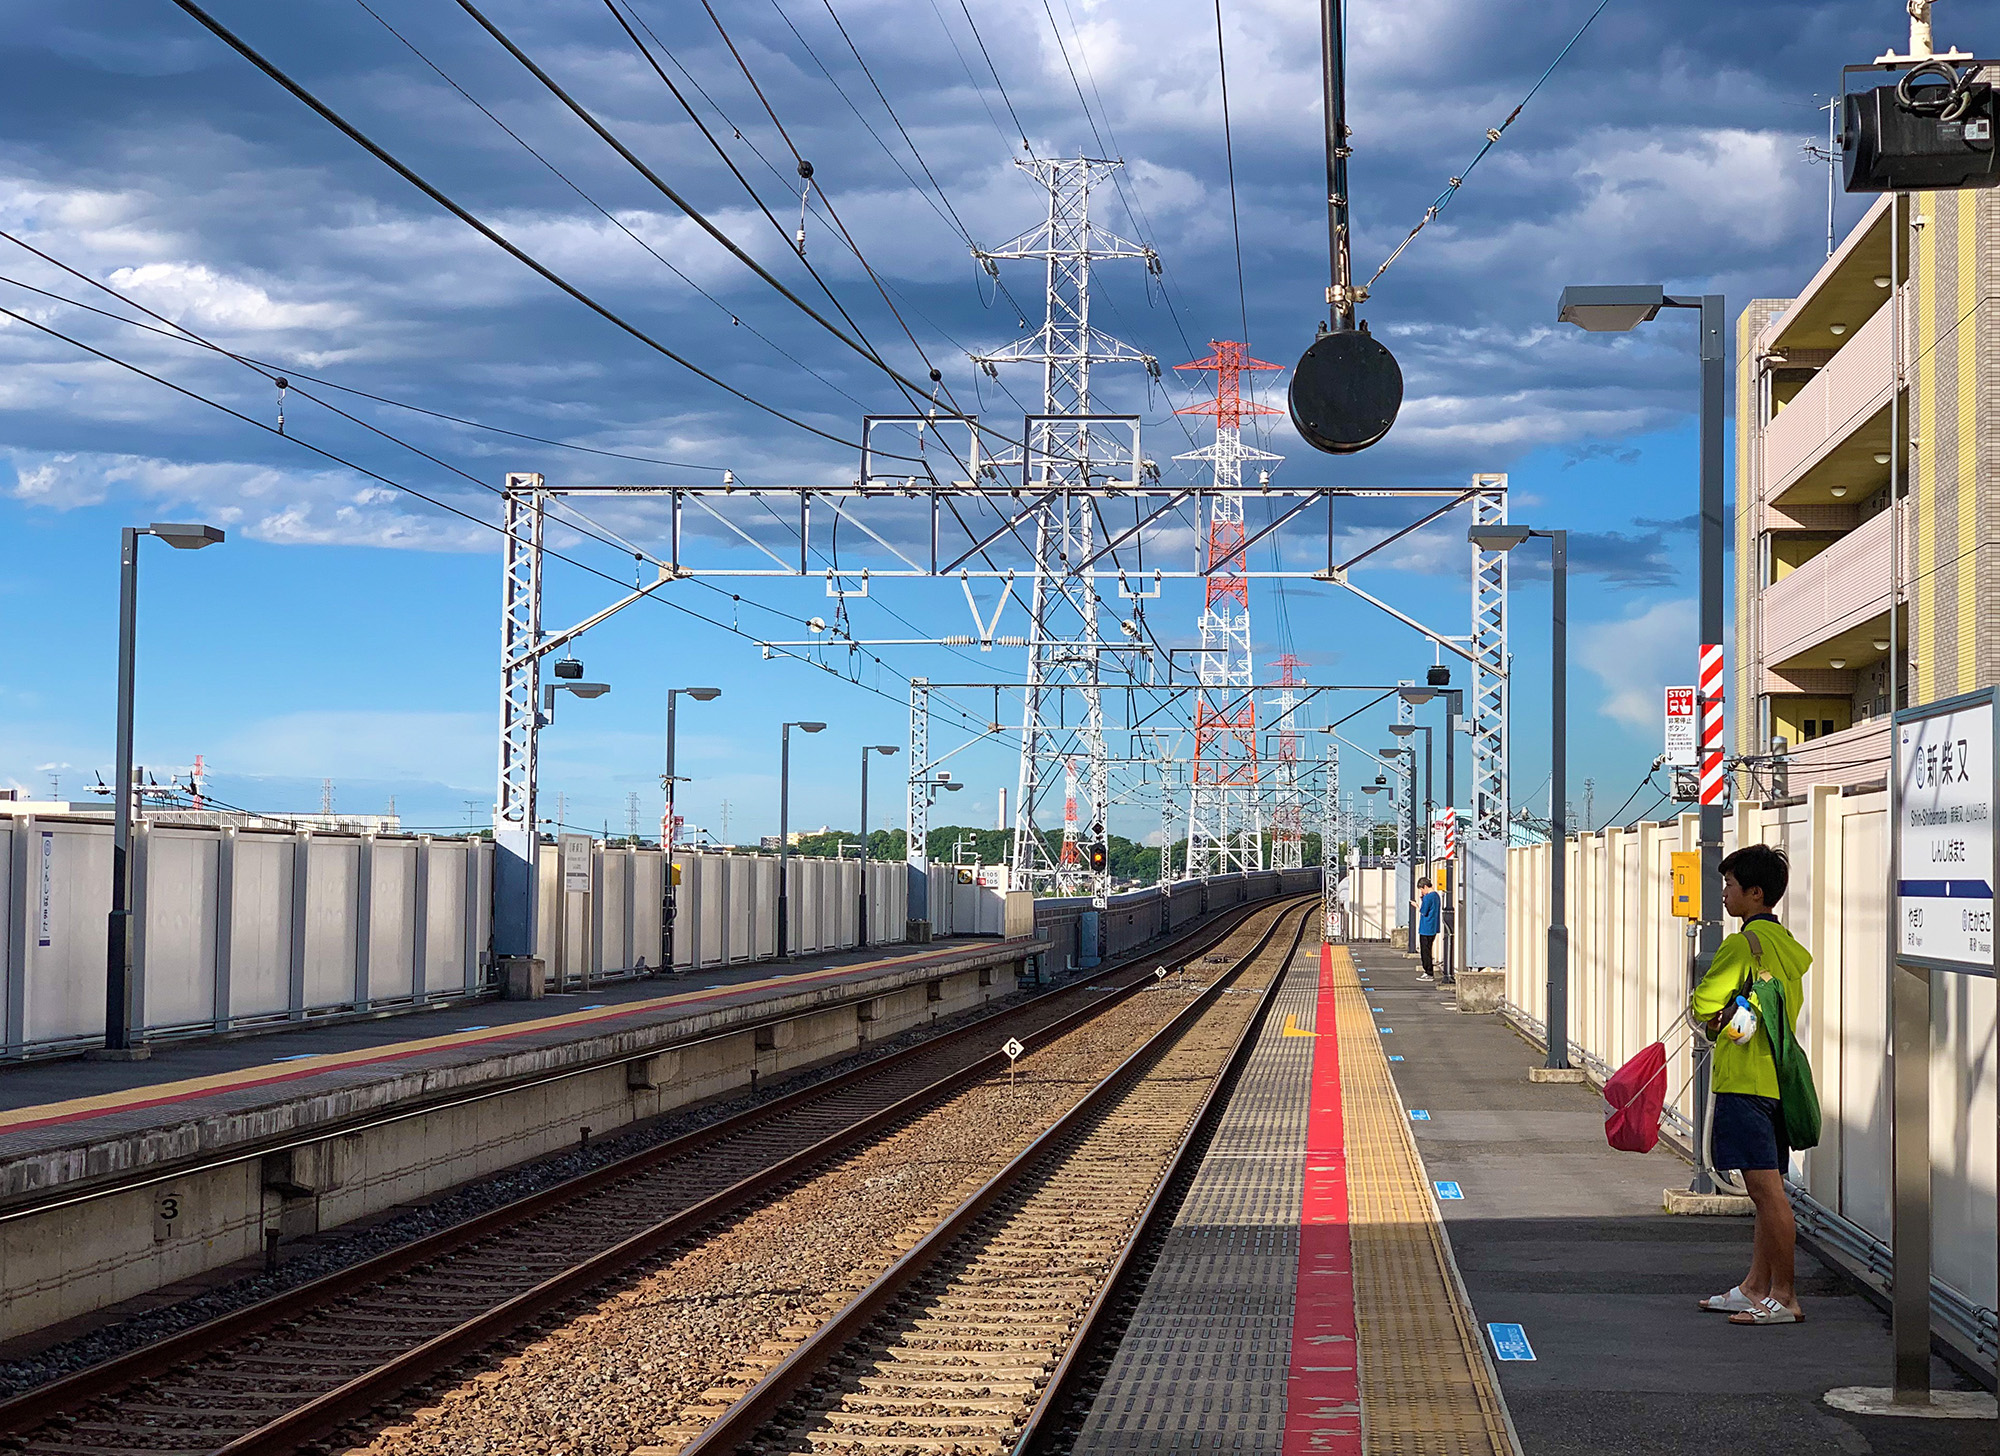 Shibamata Station in Katsushika - Tokyo